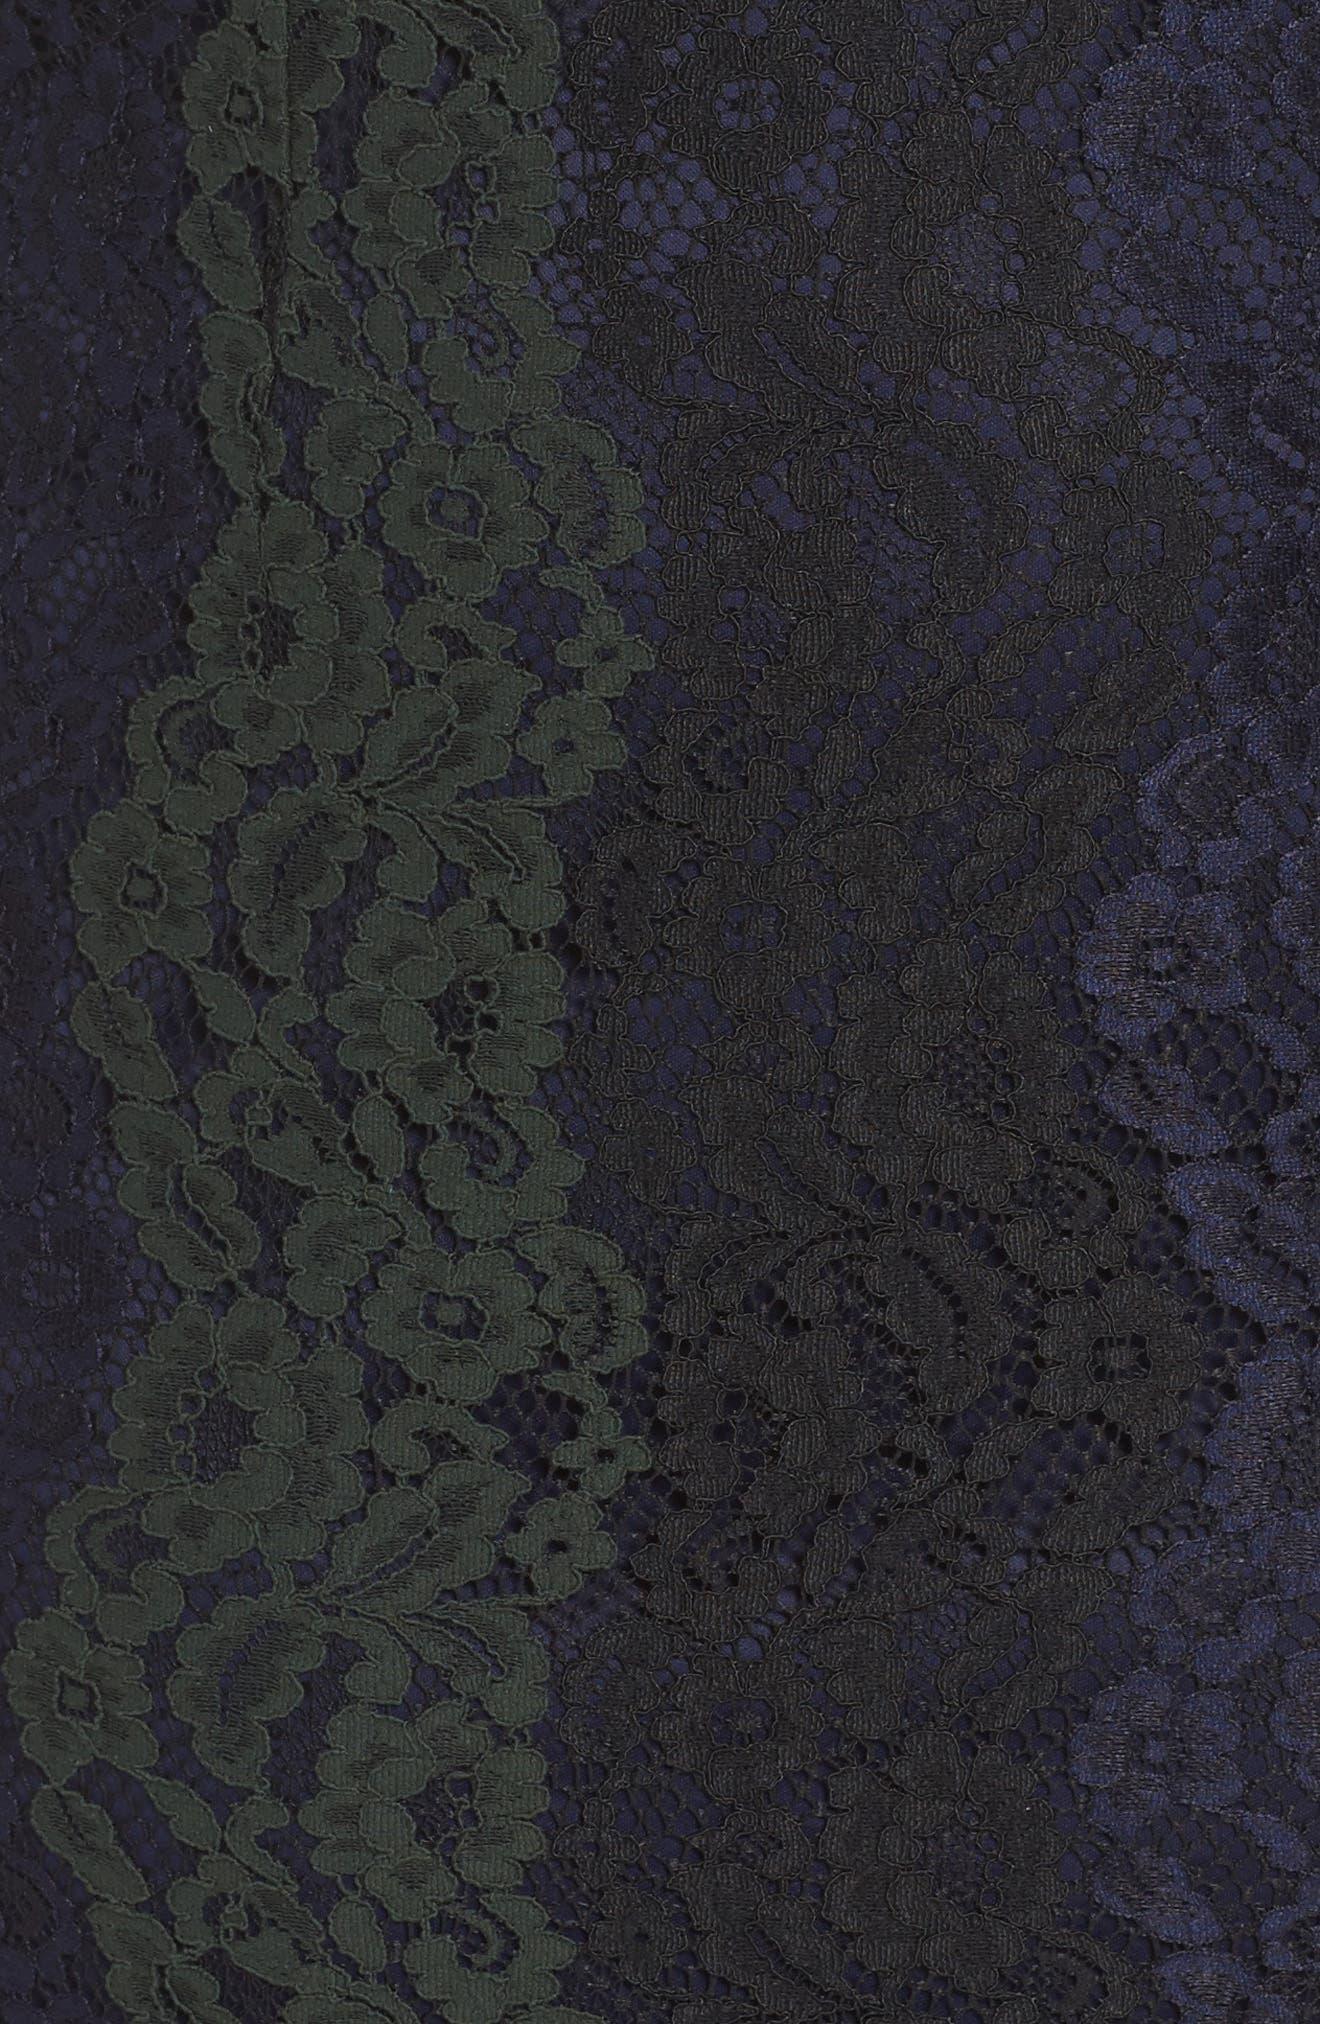 Colorblock Lace Sheath Lace,                             Alternate thumbnail 5, color,                             Multi